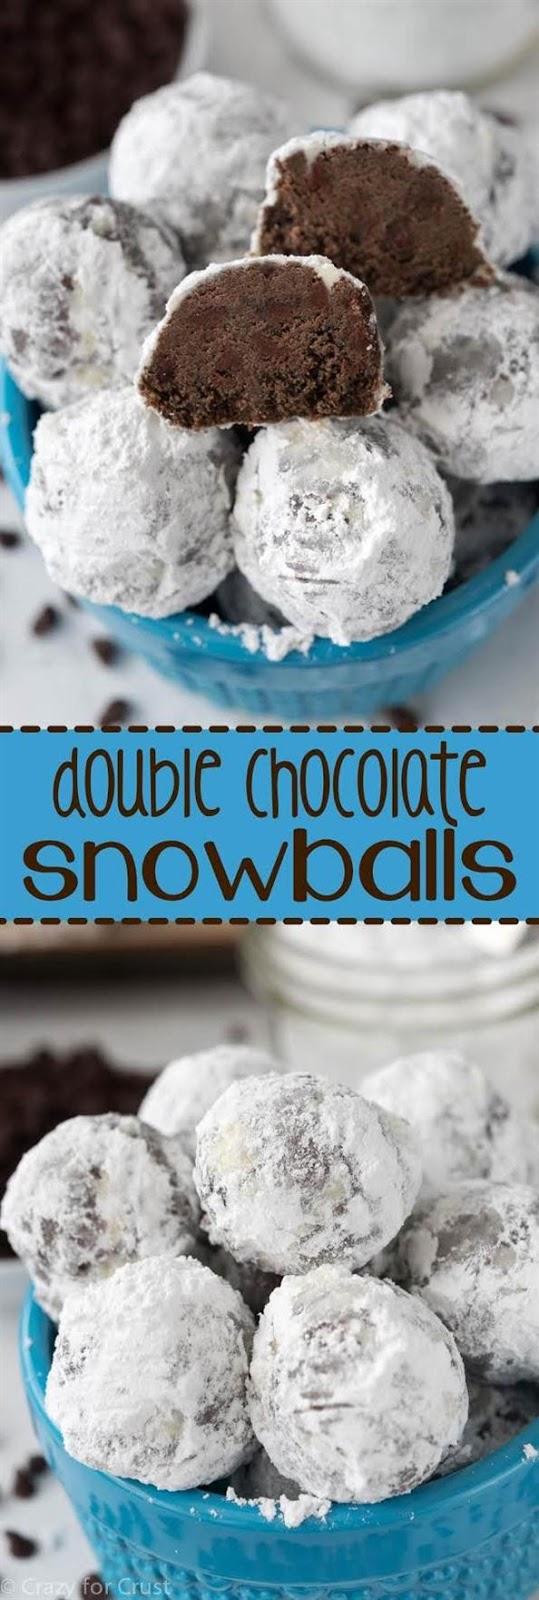 Double Chocolate Snowballs Cookies #Doublechoco #Chocolateitaly #chocolatecookies #Snowballcookies #Bescookies #Dessert #Bestdessert #Americandessert #Italiandessert